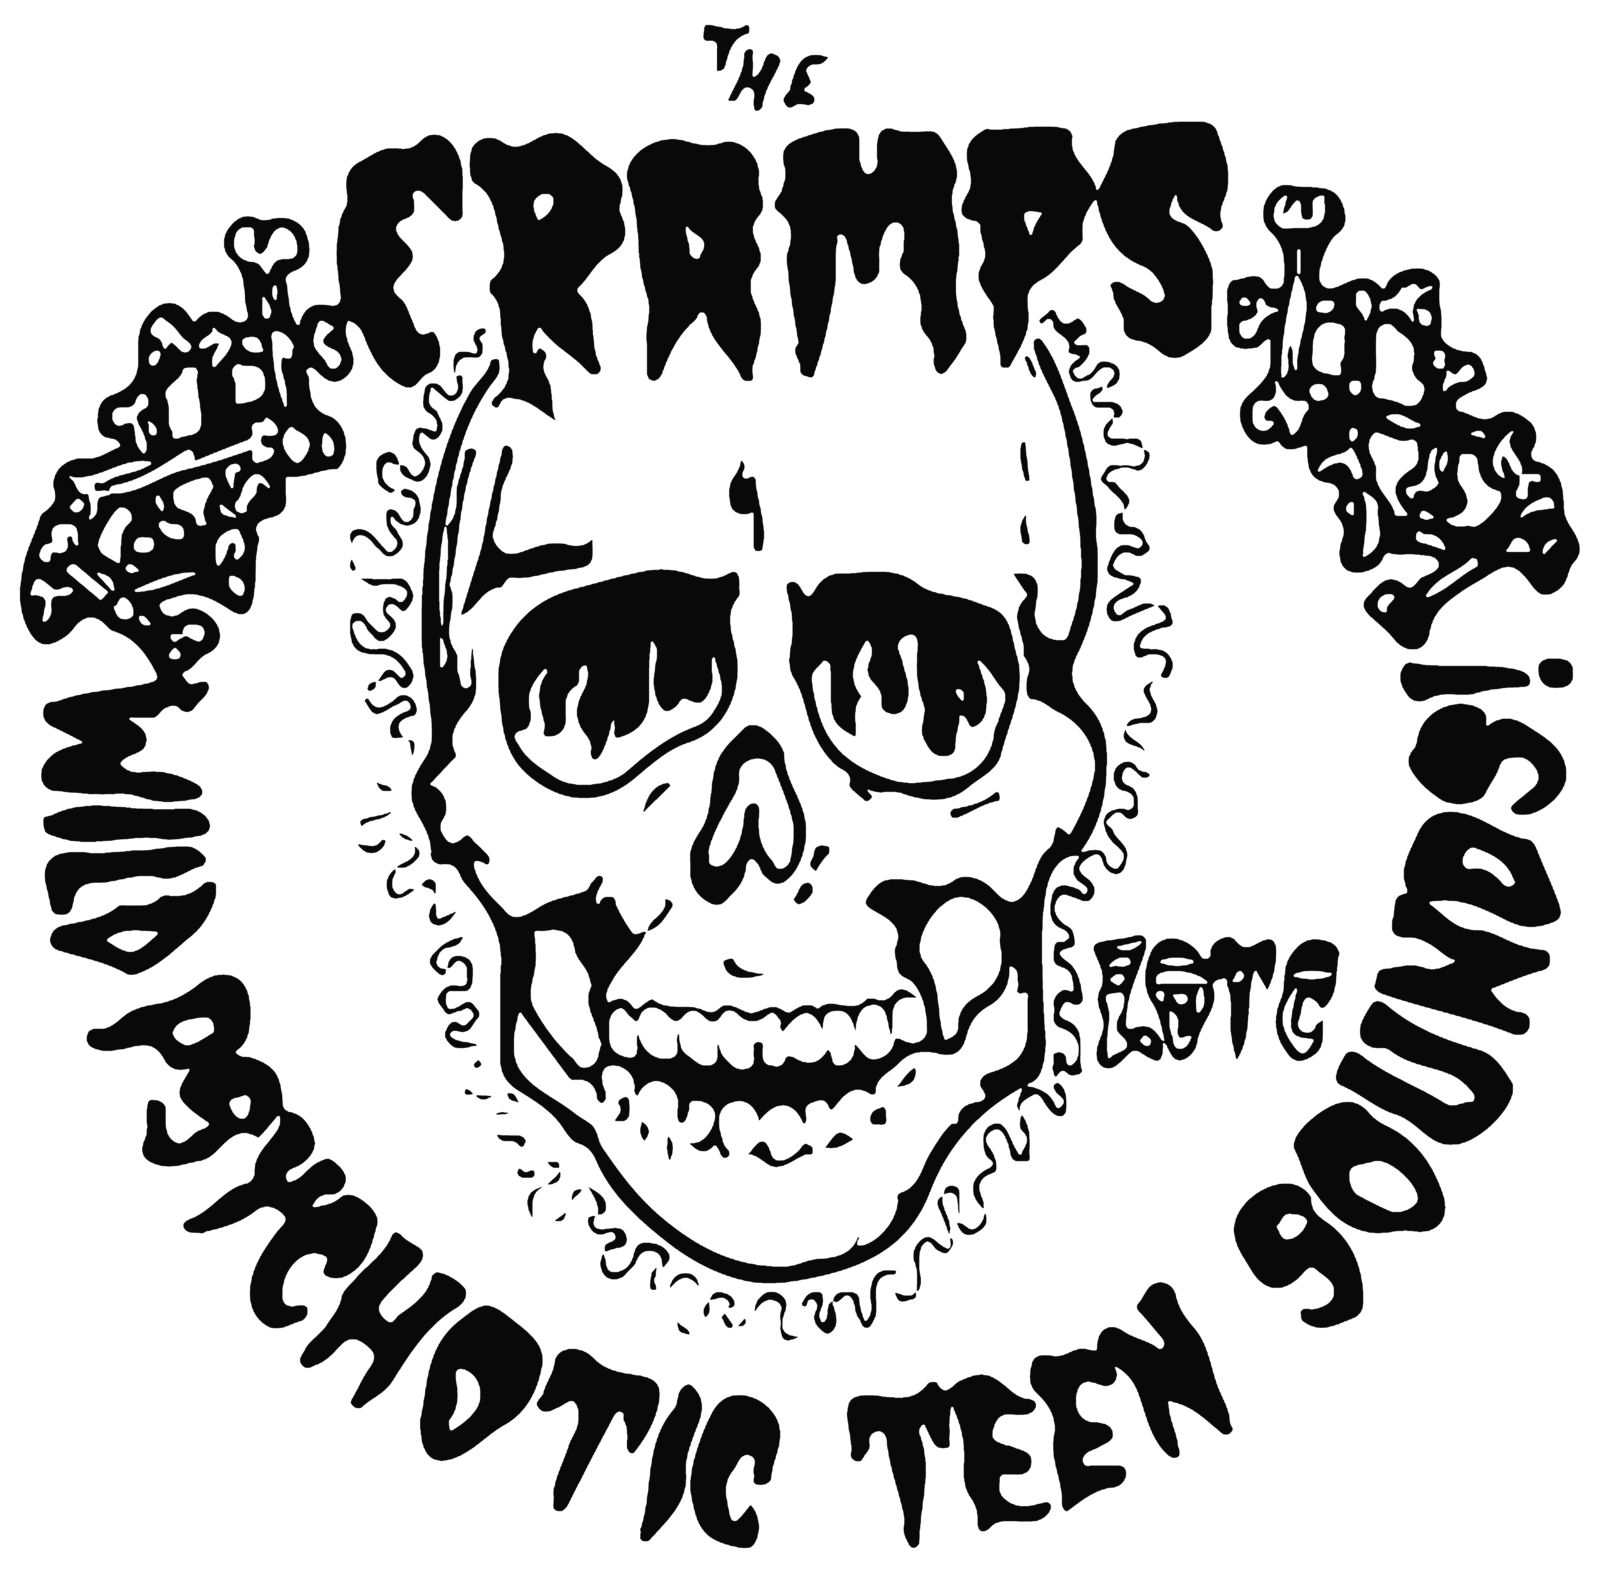 Psychotic Teen Sounds t shirt 100% cotton rockabilly cramps psychobilly punk